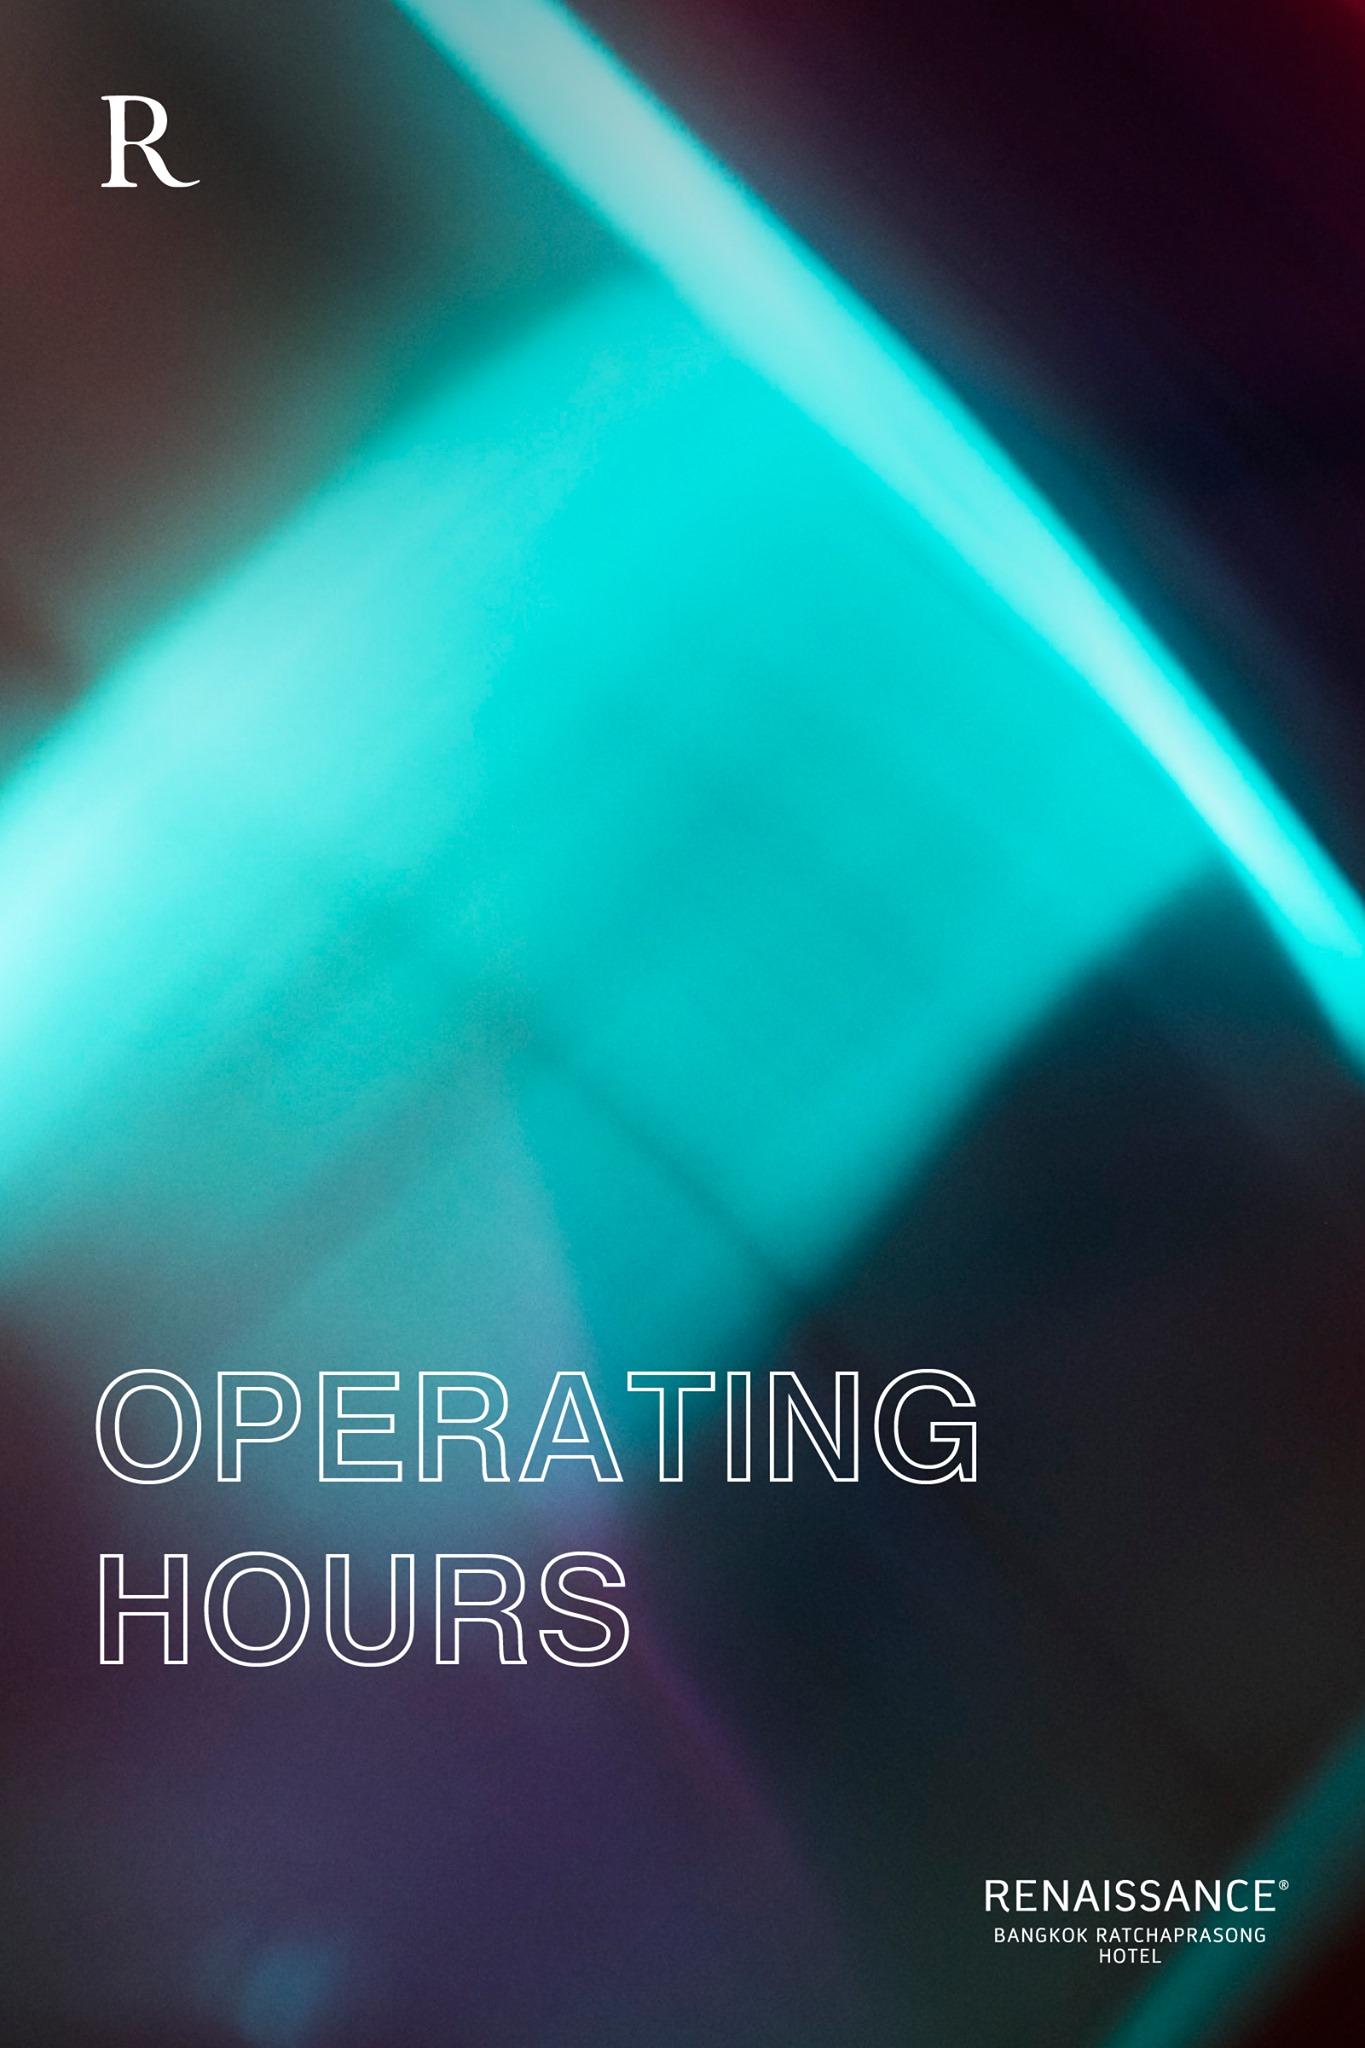 Renaissance Bangkok Ratchaprasong would like to update operating hours